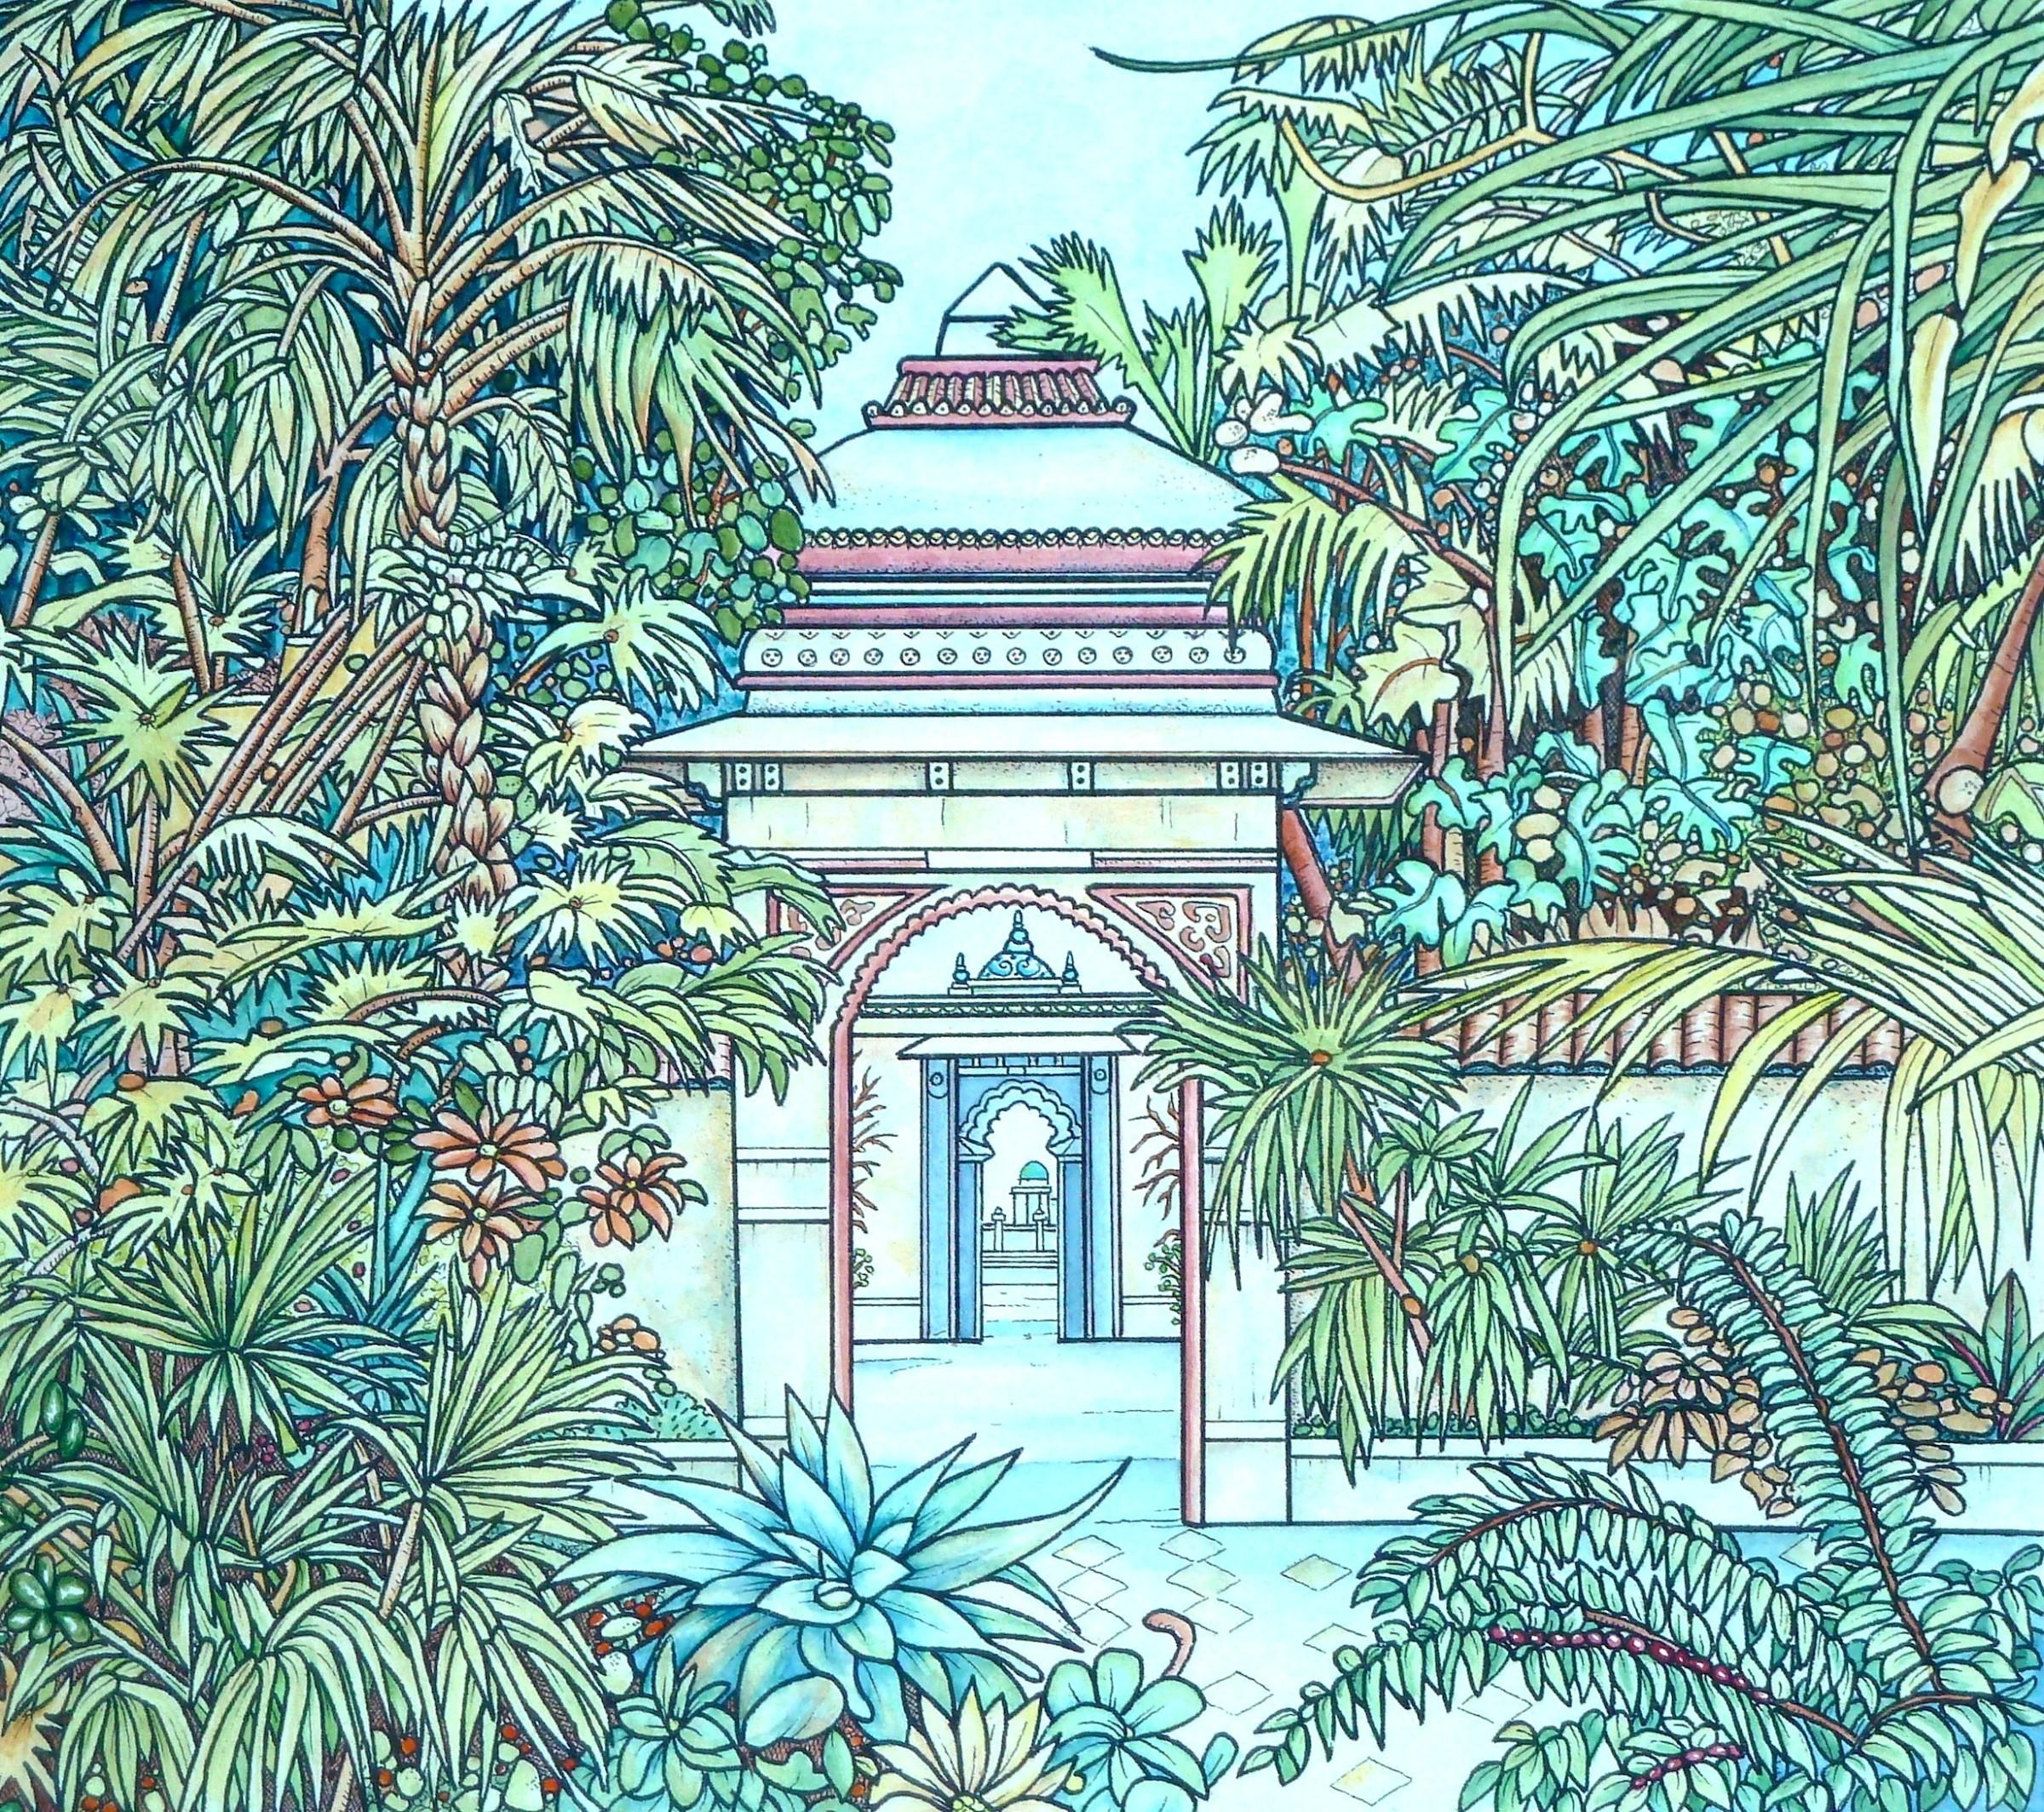 "<span class=""link fancybox-details-link""><a href=""/artists/64-meg-dutton-re/works/10727/"">View Detail Page</a></span><div class=""artist""><span class=""artist""><strong>Meg Dutton RE</strong></span></div><div class=""title""><em>Indian Garden.</em></div><div class=""medium"">etching and watercolour<br /> </div><div class=""dimensions"">35 x 40 cm</div><div class=""edition_details"">edition of 60</div><div class=""price"">£350.00 unframed</div>"